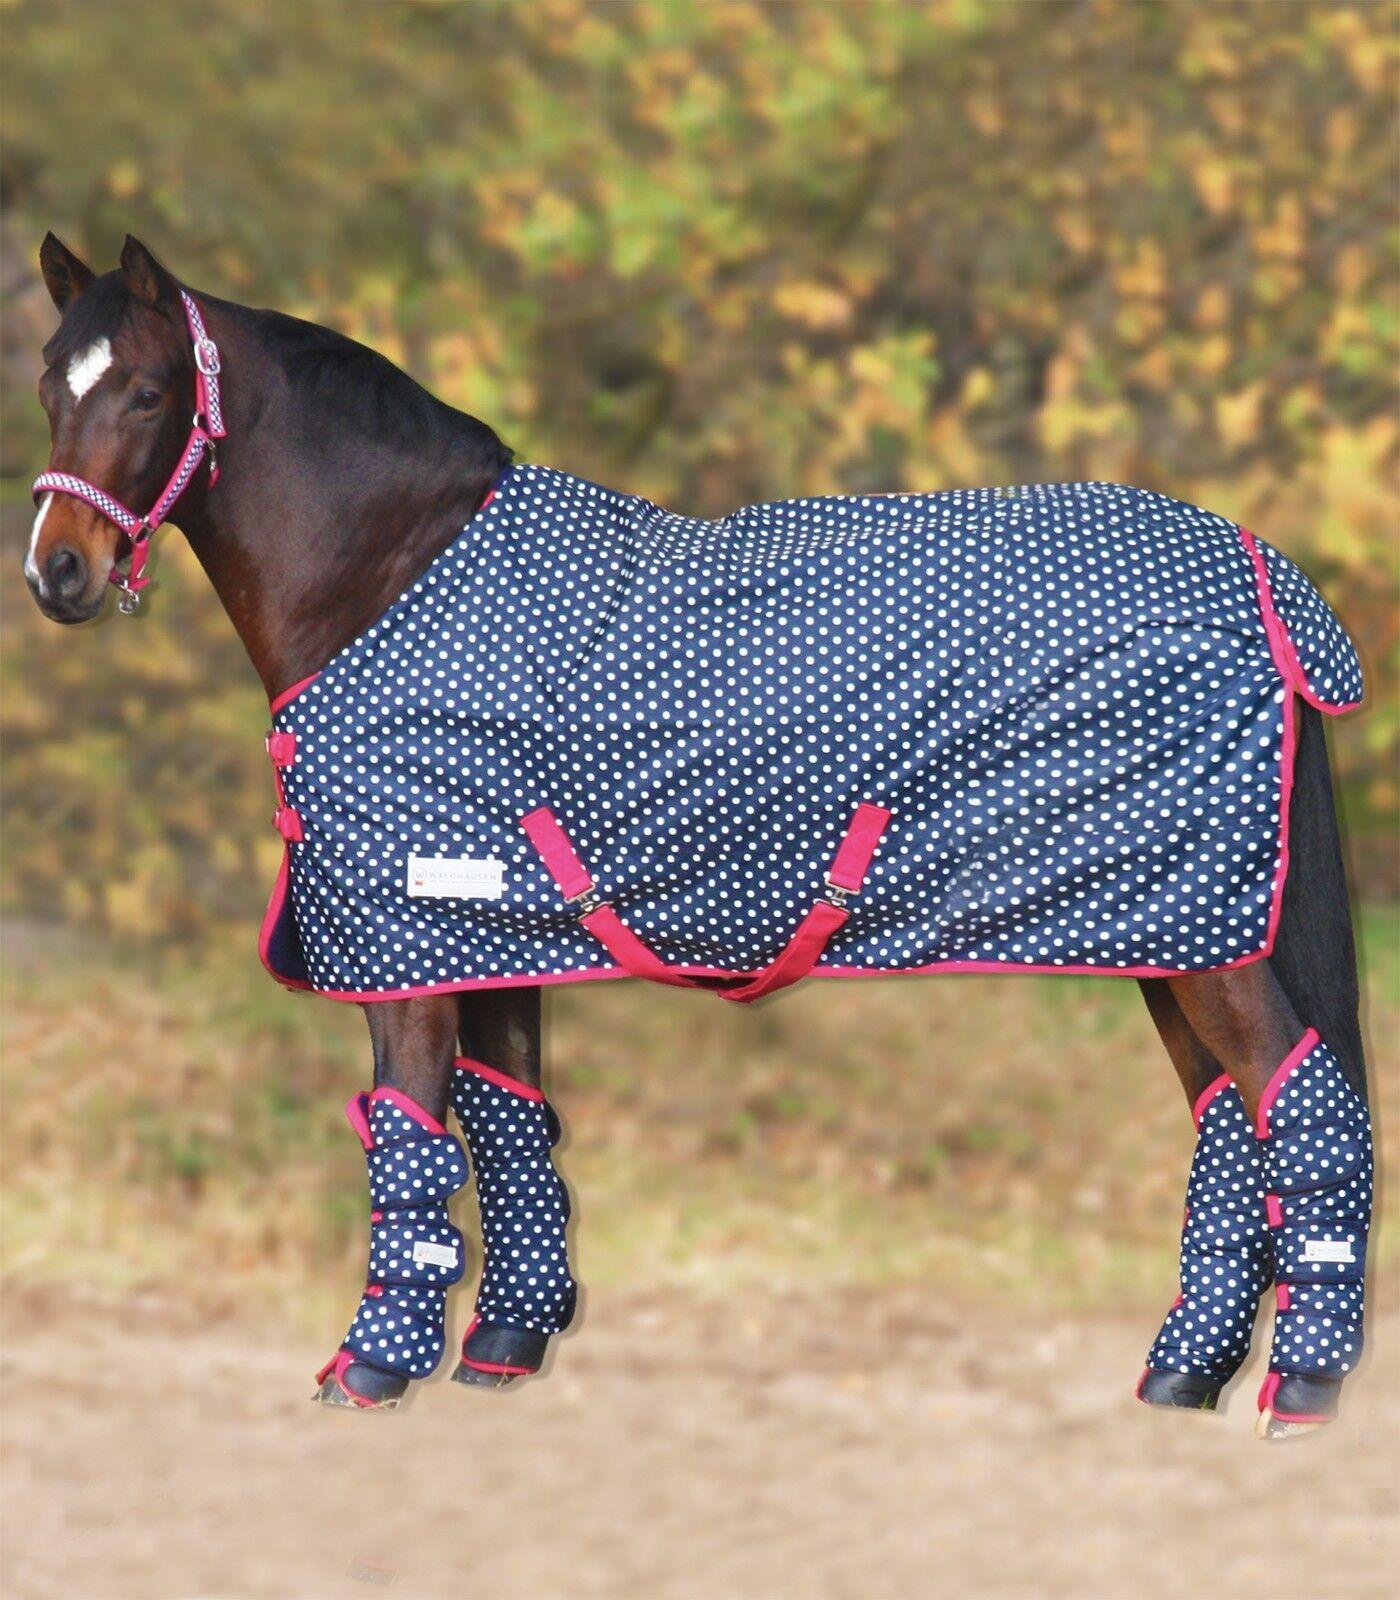 Manta Exteriores, Hoja, Manta Ganadero Pony Unicorn 100G Relleno, Impermeable